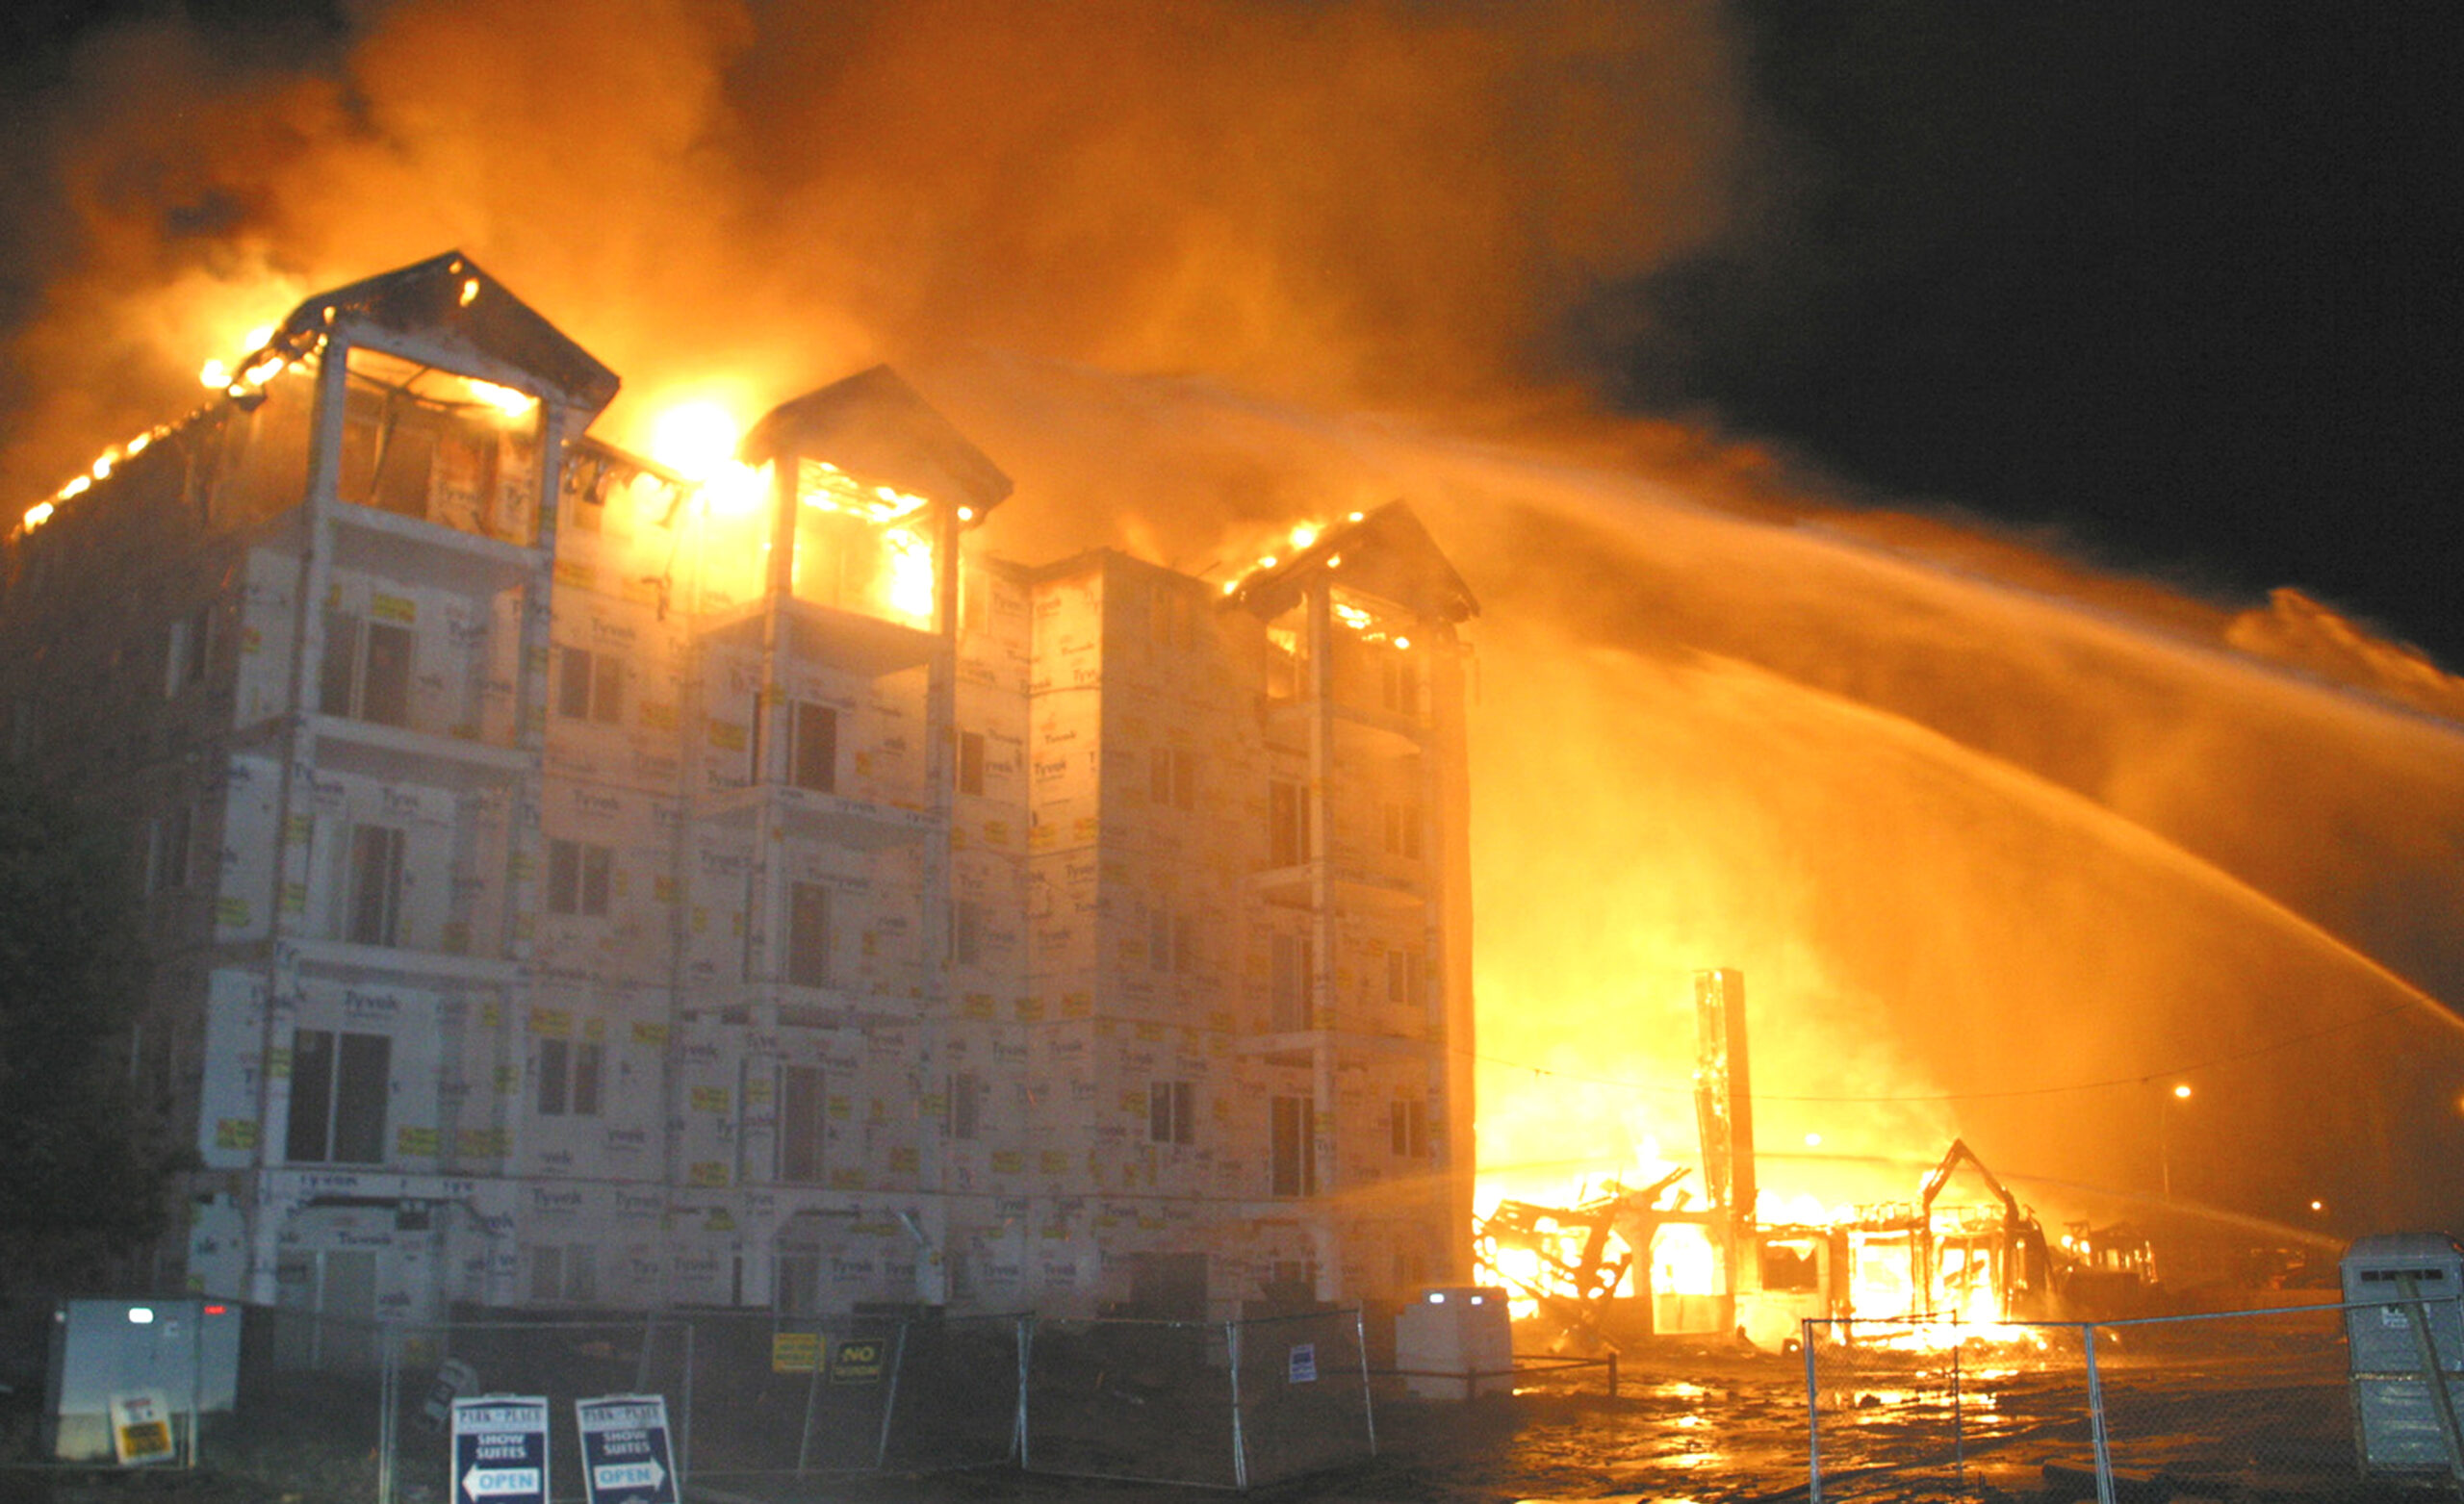 Tenants Insurance Fire Claime